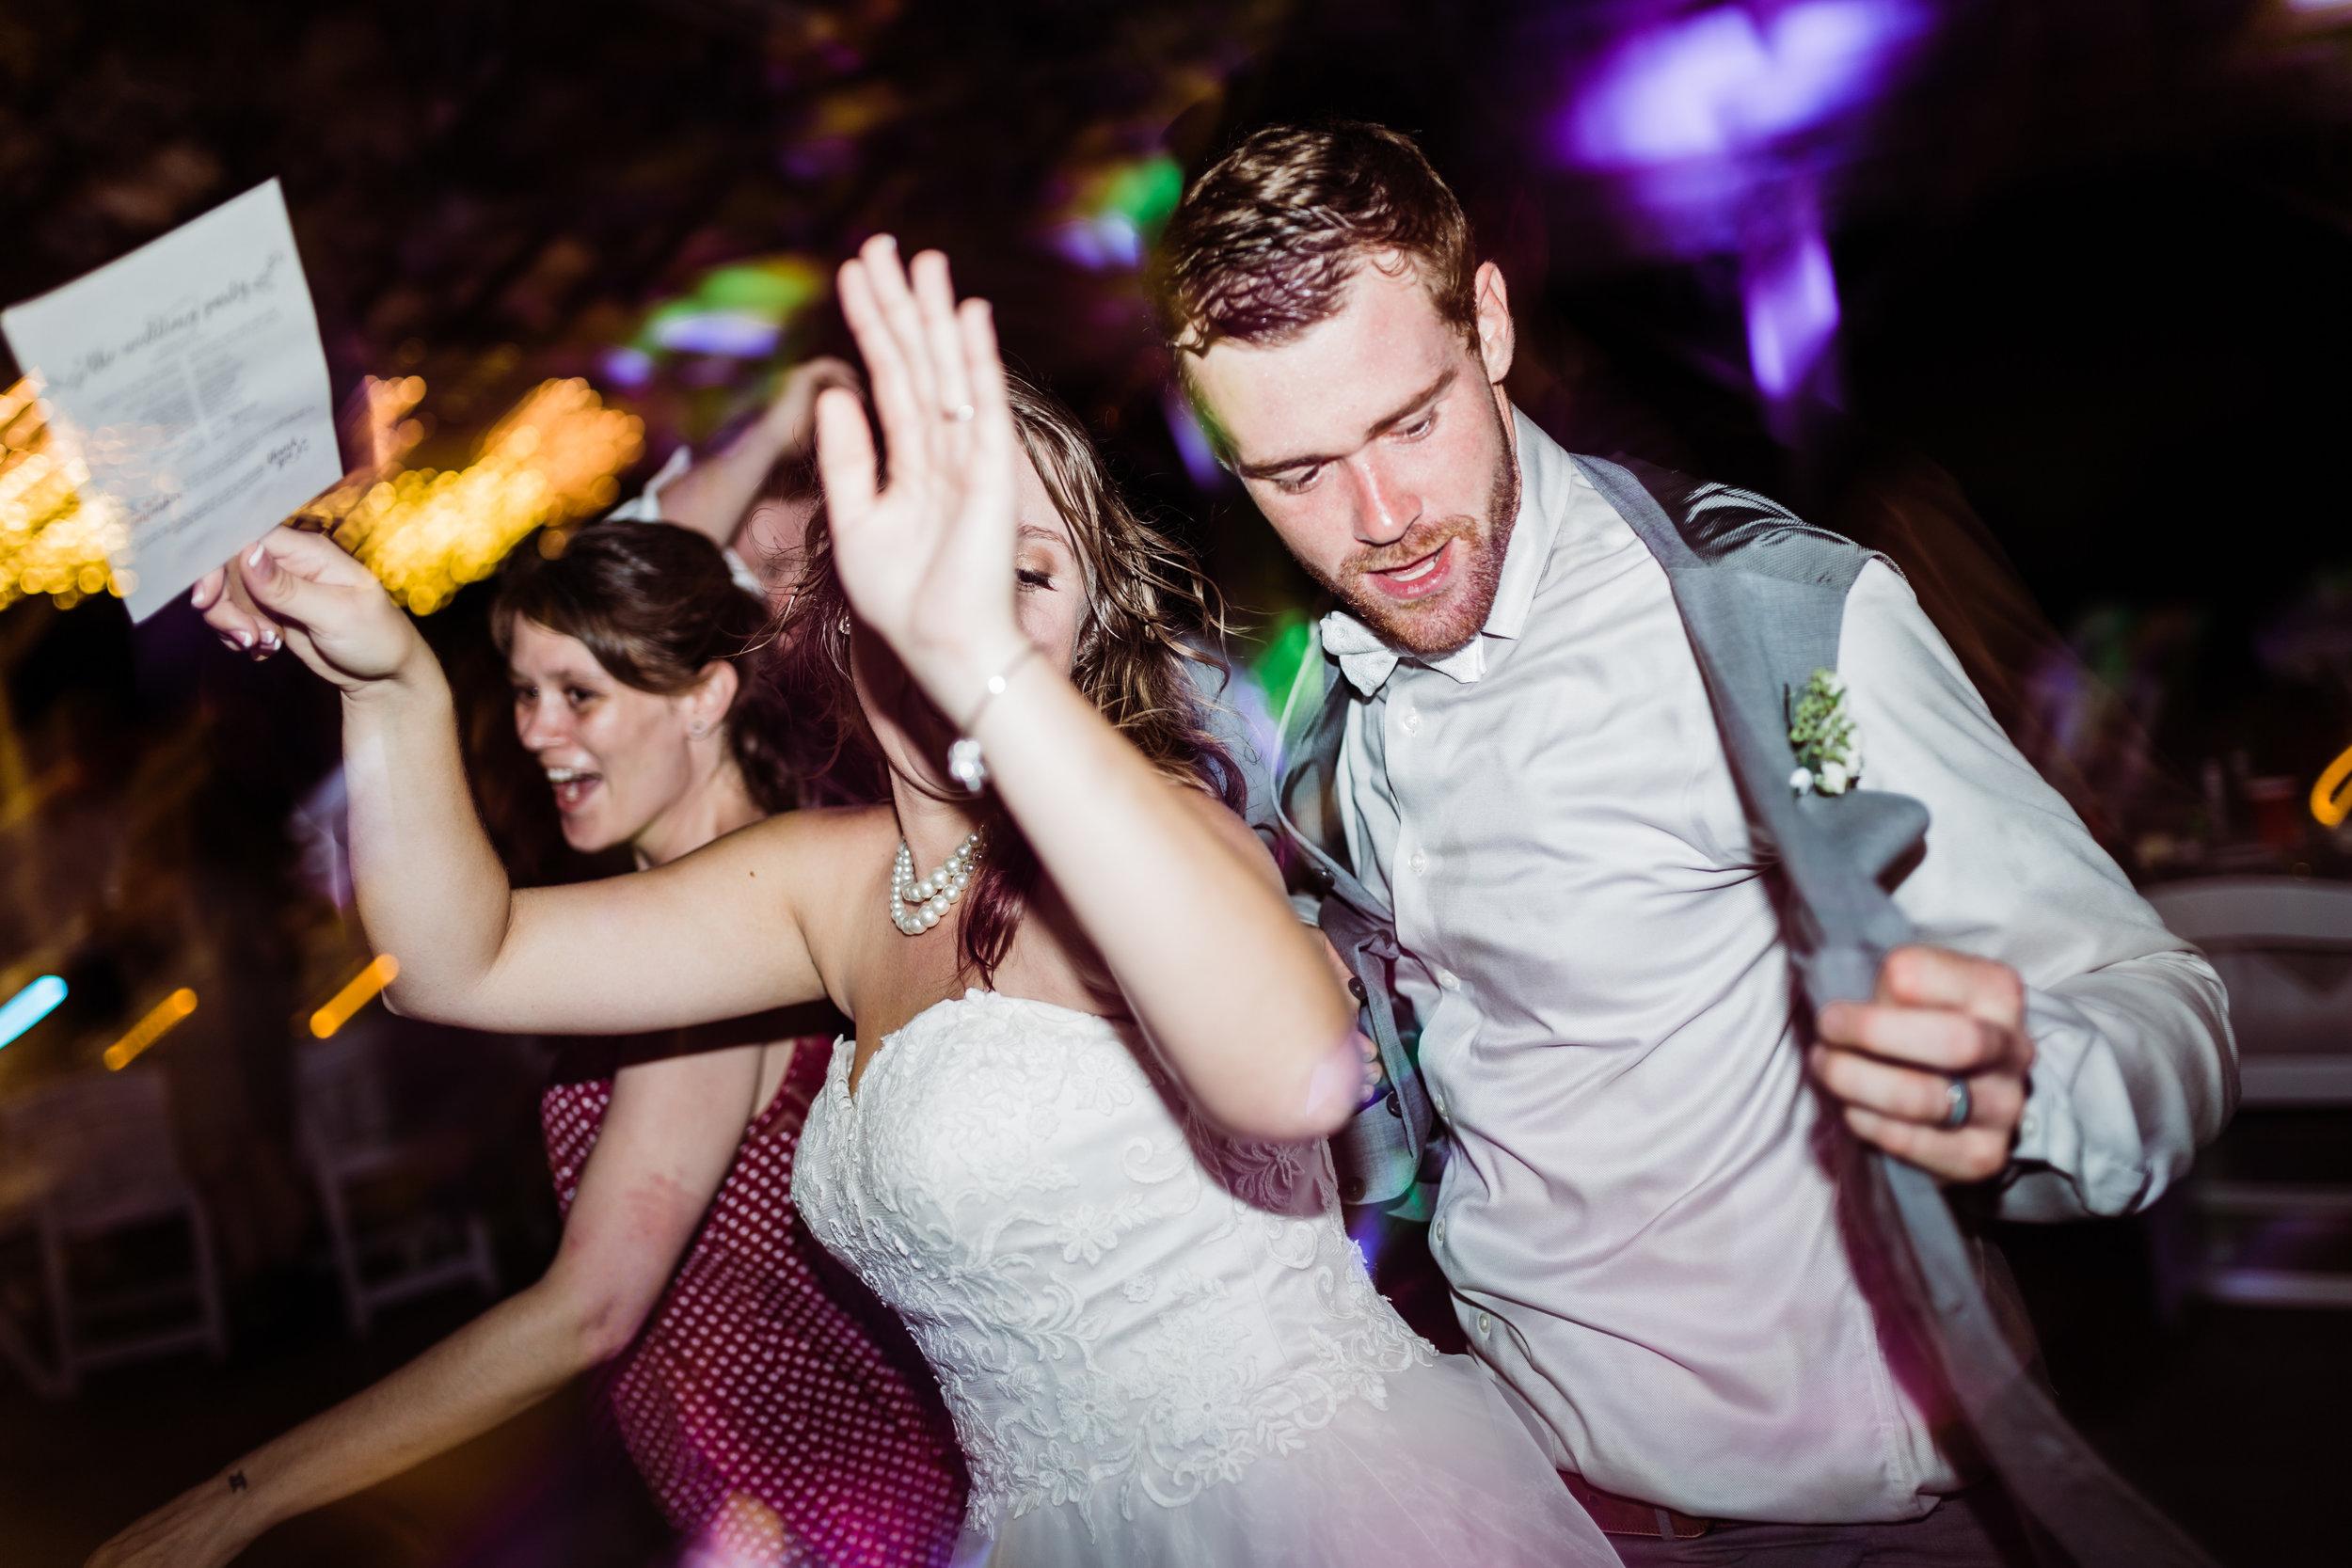 2017.10.14 Samantha and Matthew Crabtree Sarasota Wedding (630 of 708).jpg